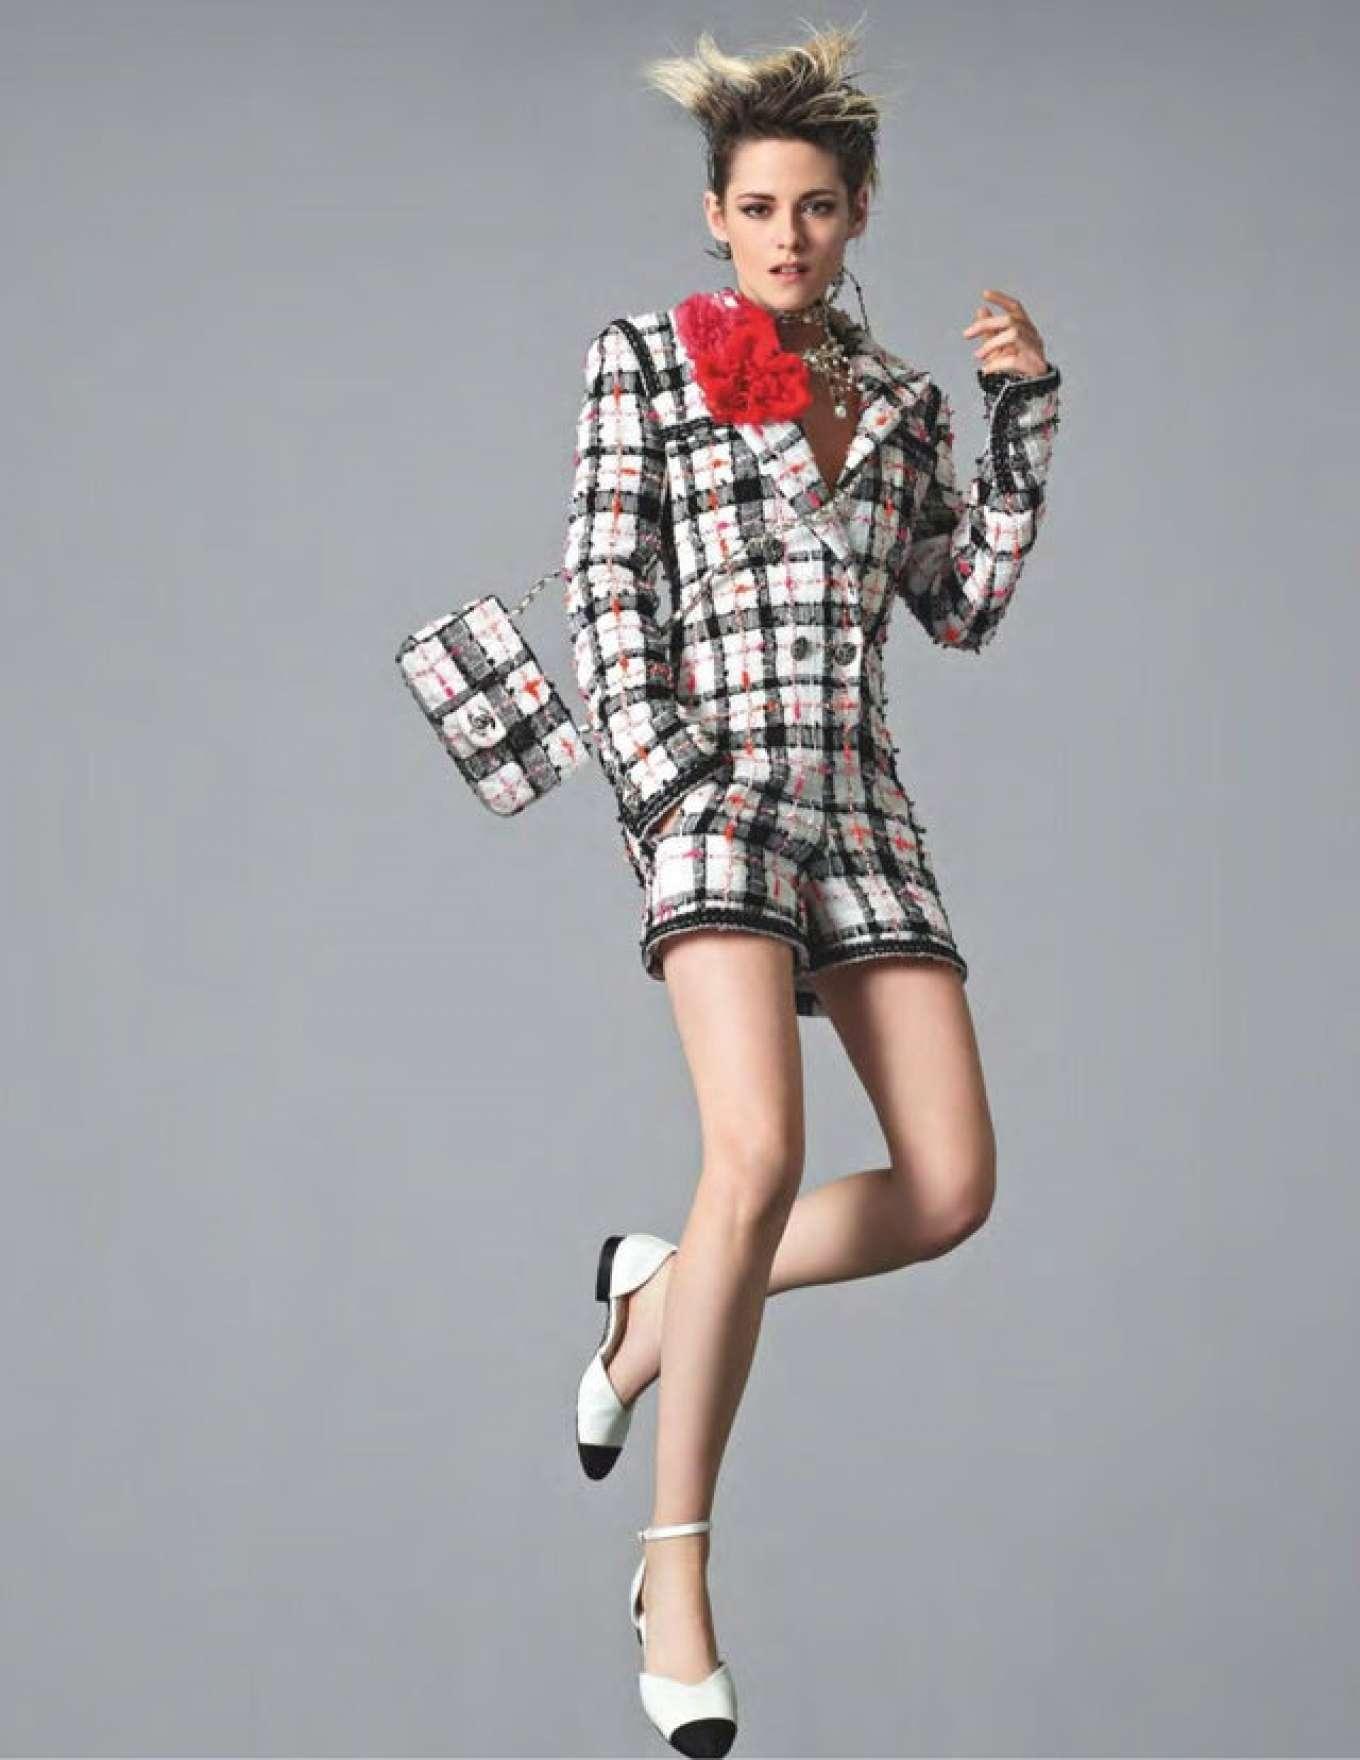 Kristen Stewart - Chanel Spring 2020 Campaign Preview